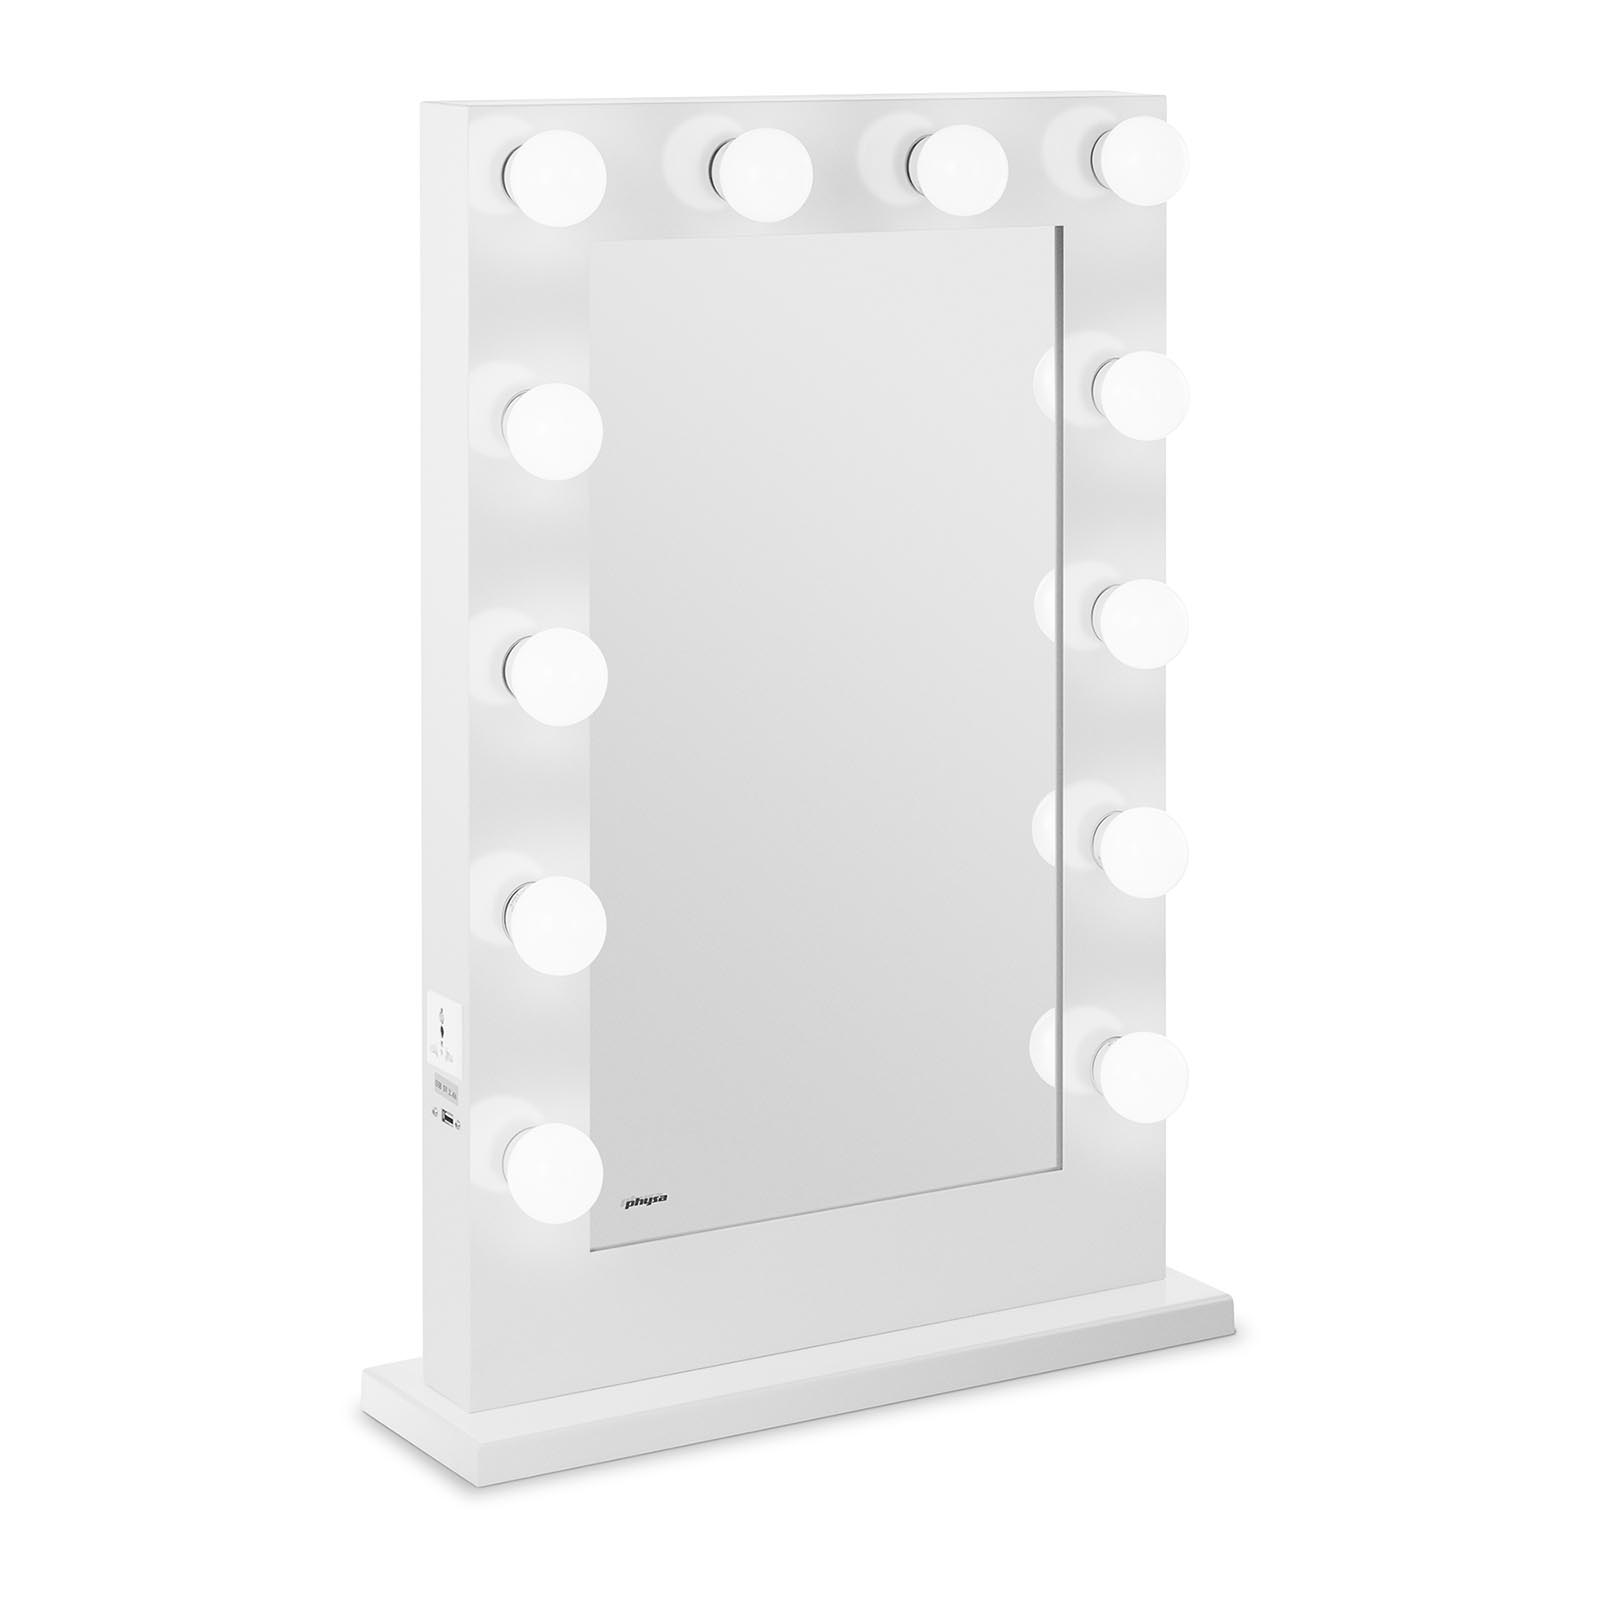 Lustro z żarówkami - LED - biała rama - 75 x 50 cm